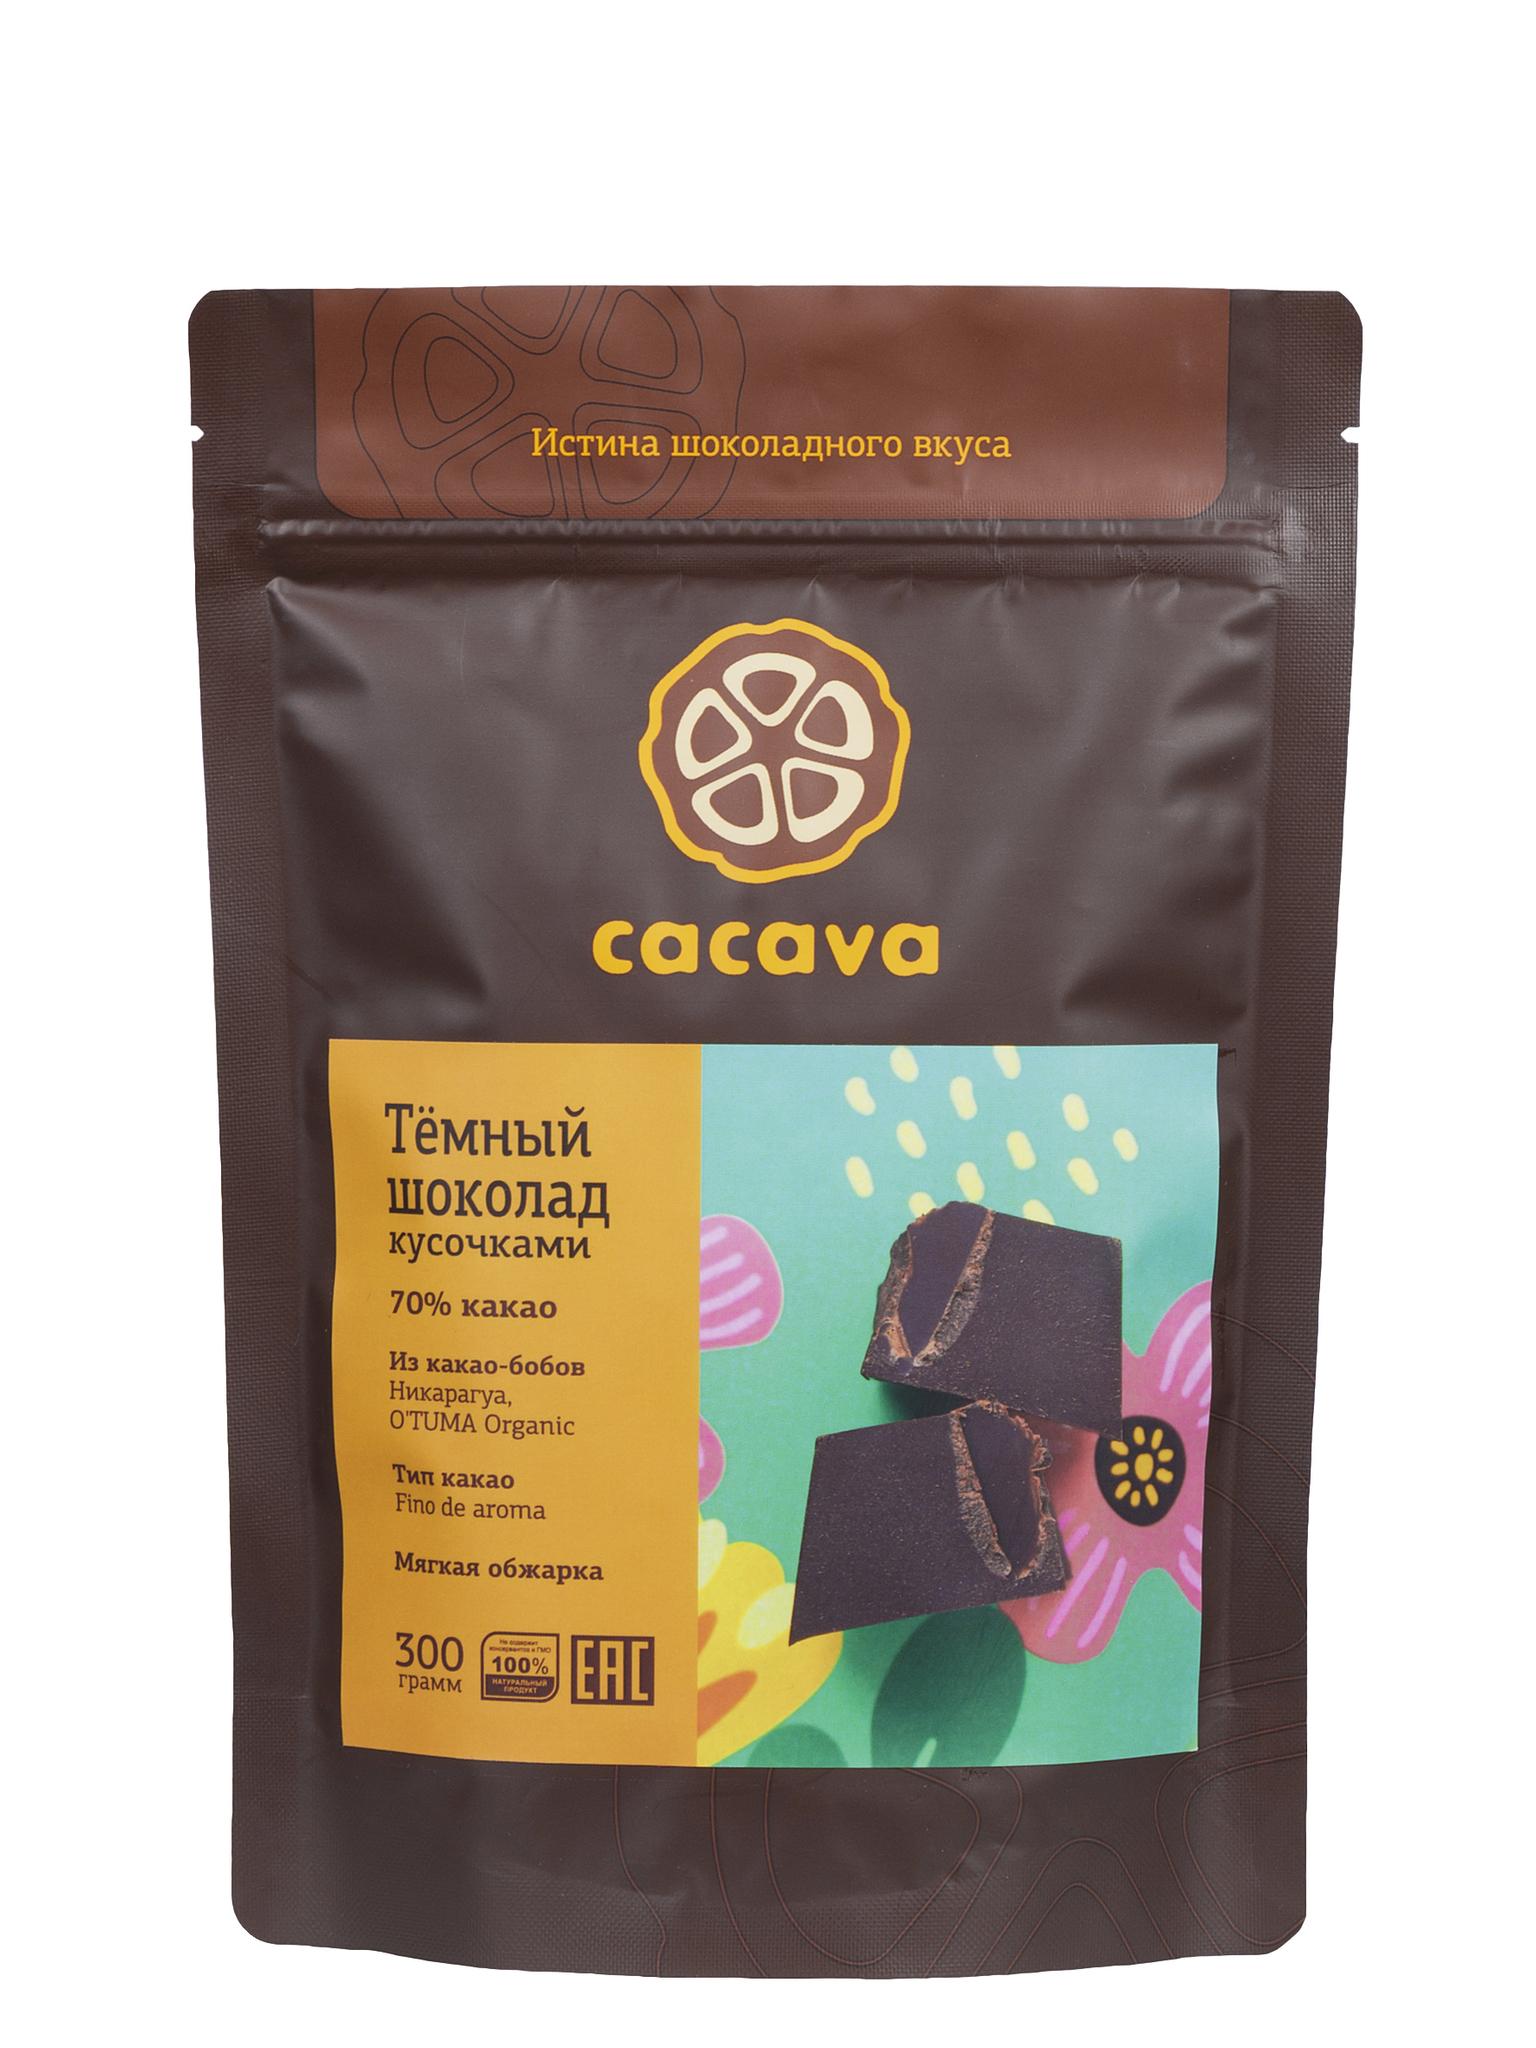 Тёмный шоколад 70 % какао (Никарагуа O'Tuma), упаковка 300 грамм